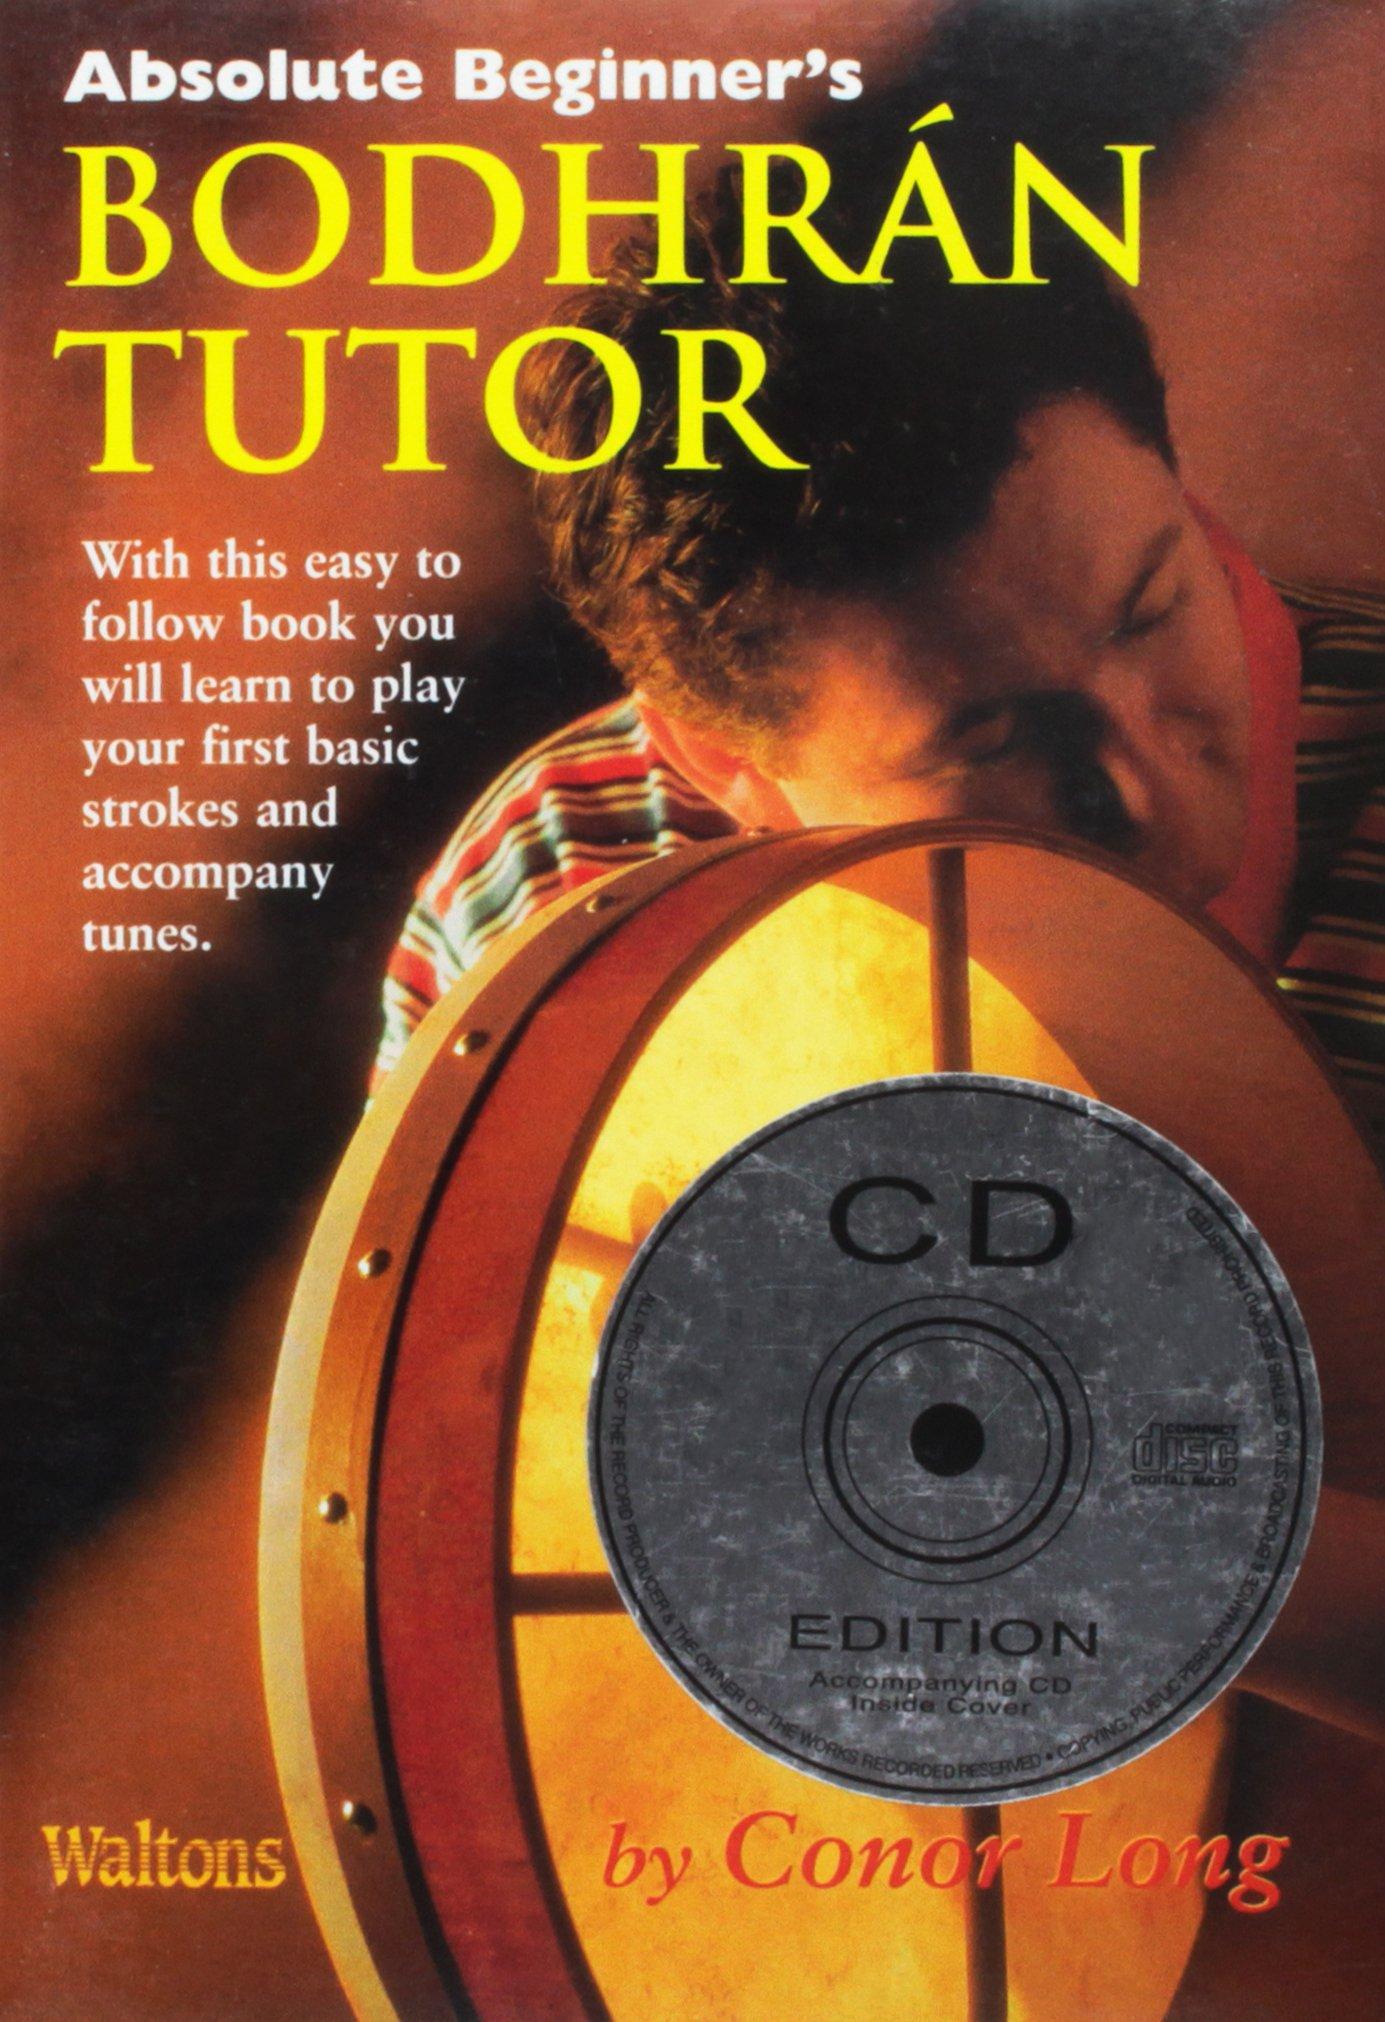 Absolute Beginner's Bodhran Tutor,Bk/CD